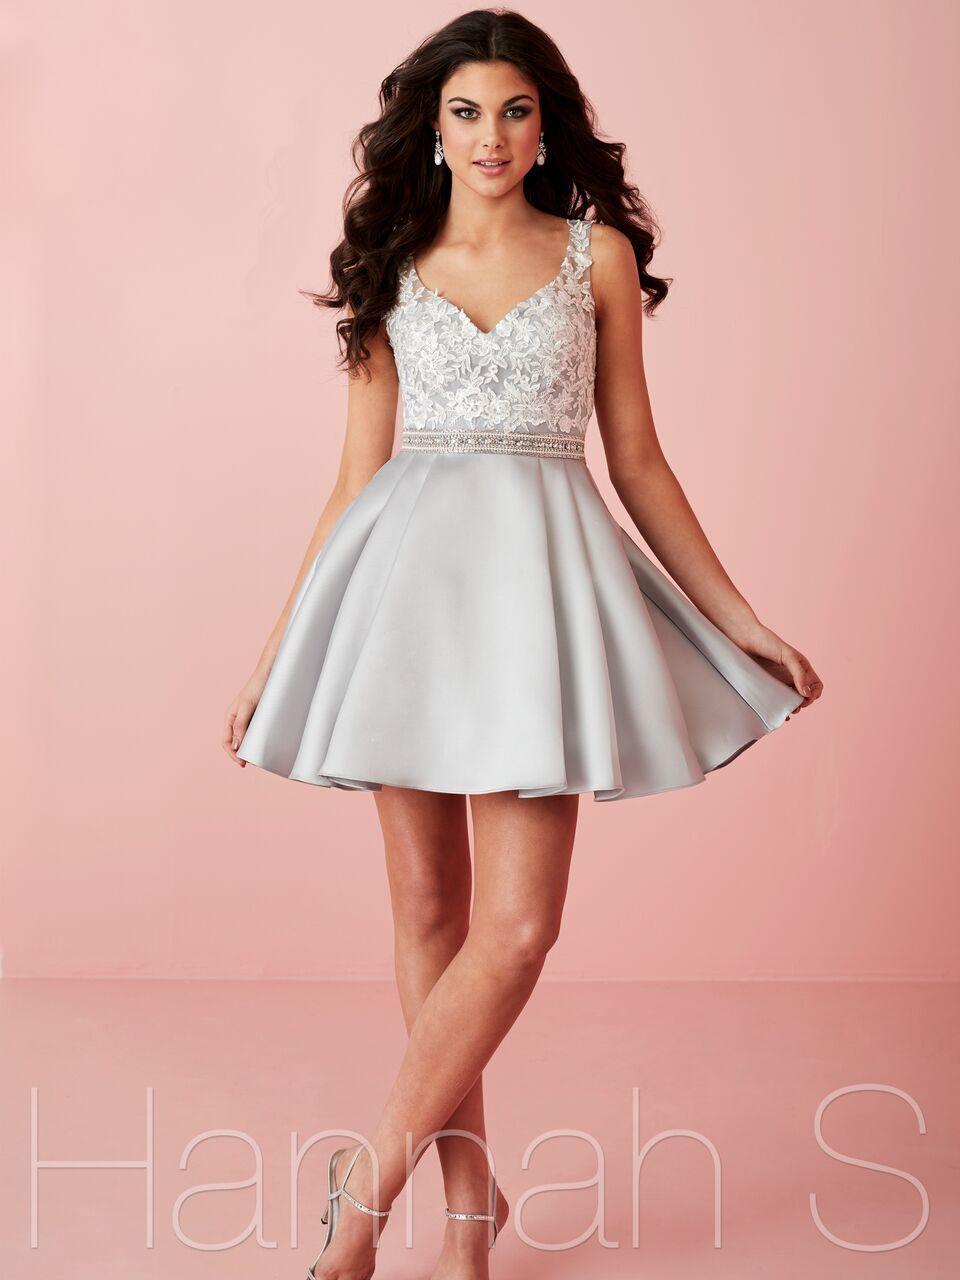 27107 Silver Short Homecoming Dress | Hair and dress | Pinterest ...